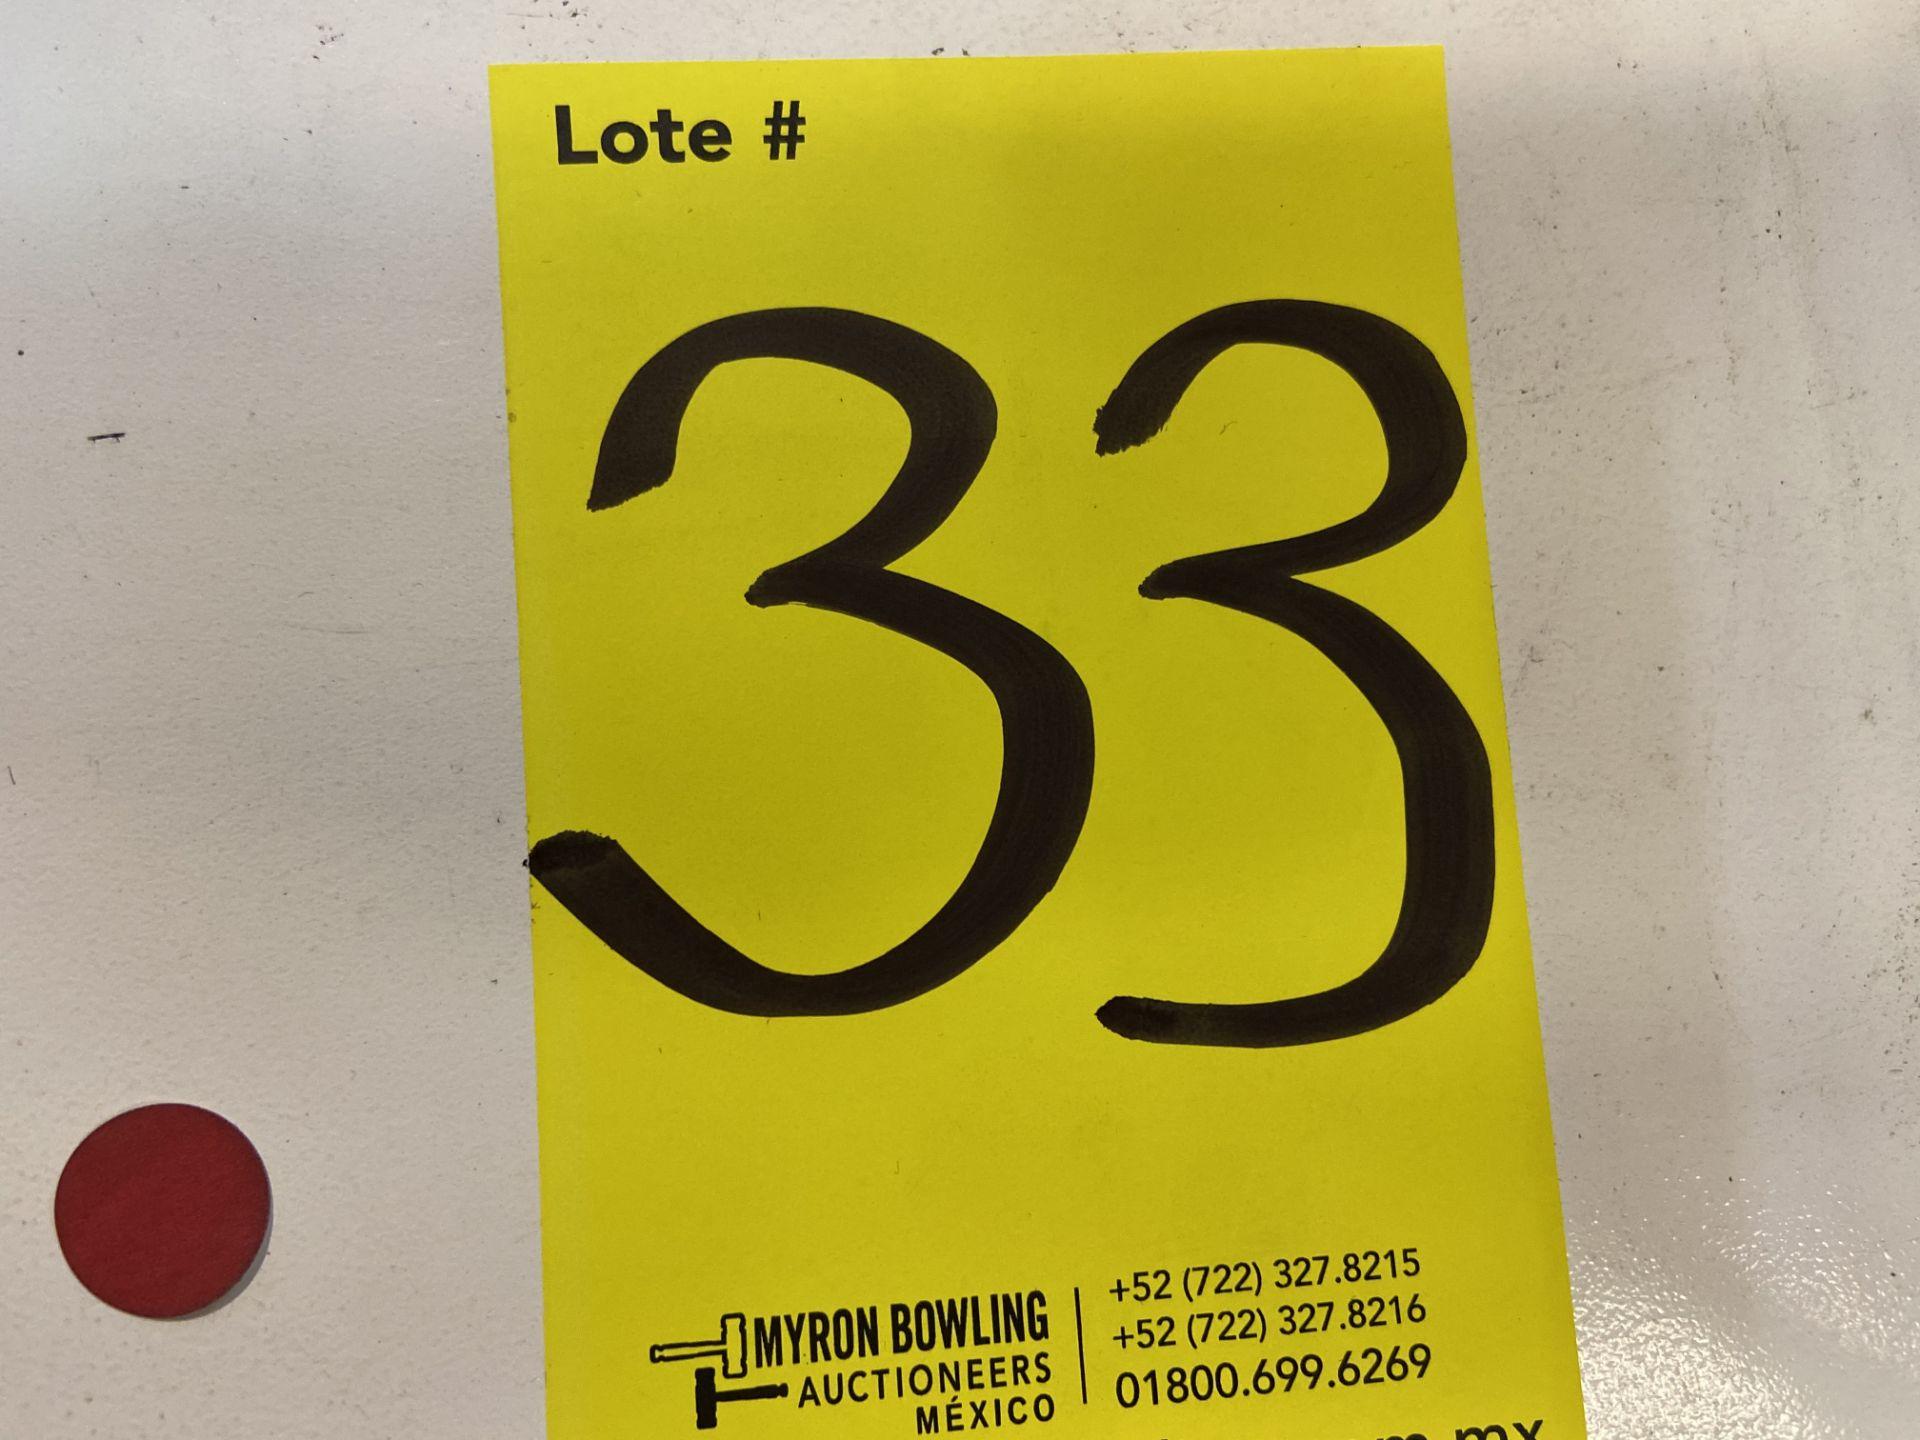 Lot 33 - Prensa plana neumática marca H&H, Modelo: CS-654